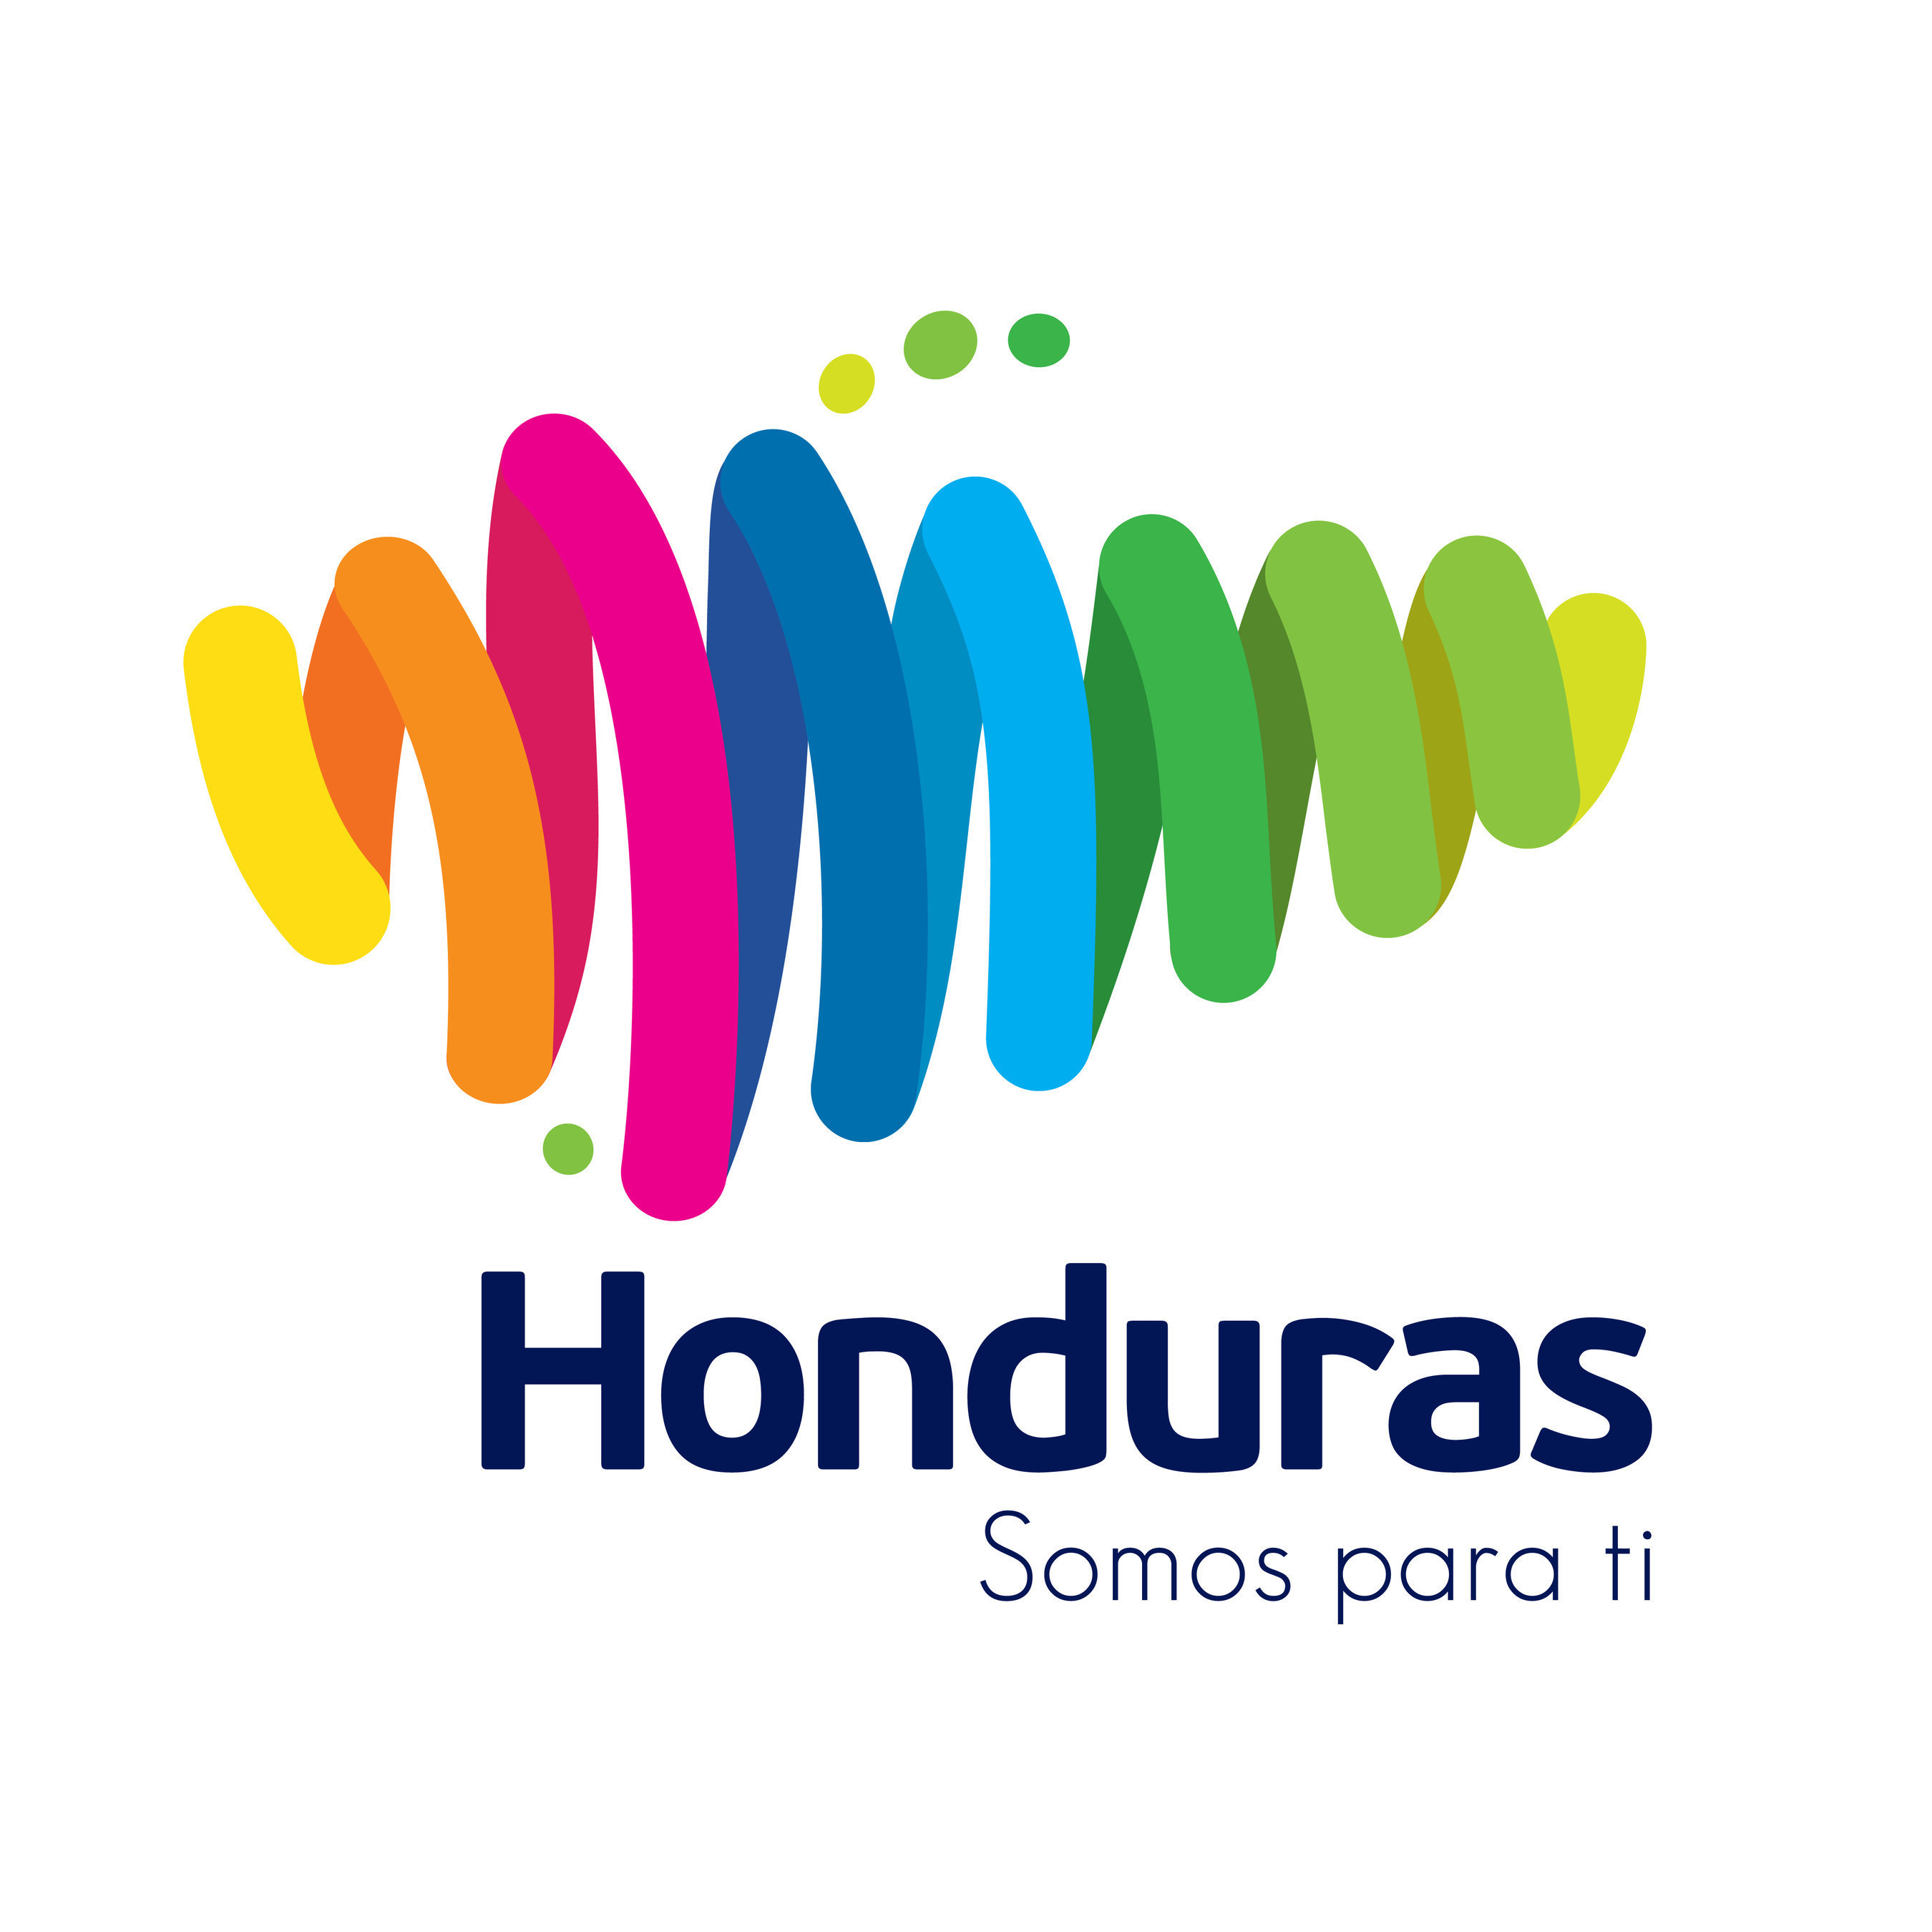 Honduras: World Bank's Partnership Strategy Aligned With